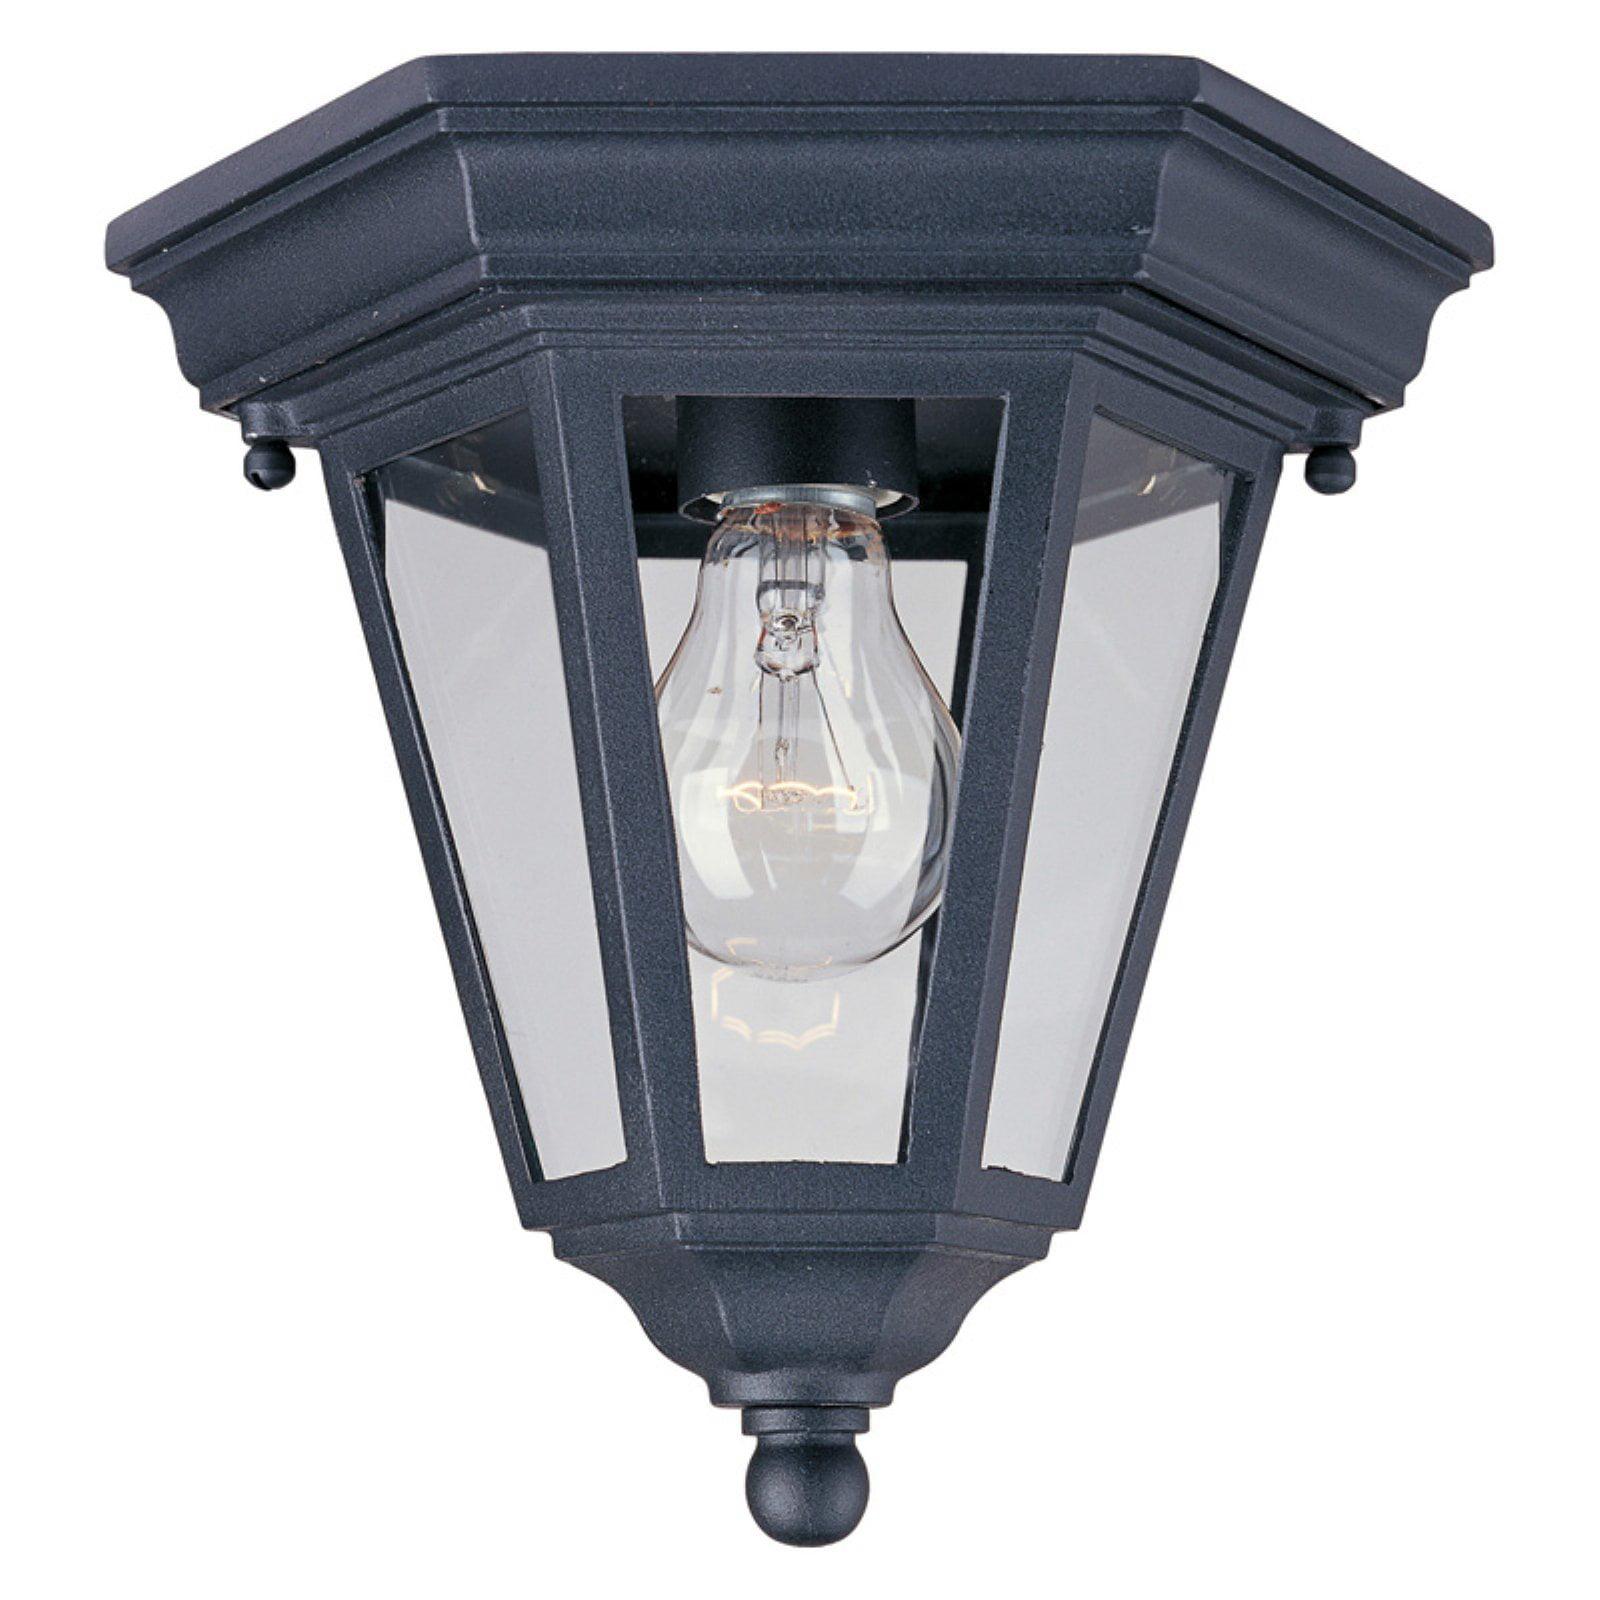 Maxim Westlake Outdoor Ceiling Light - 8.5H in.